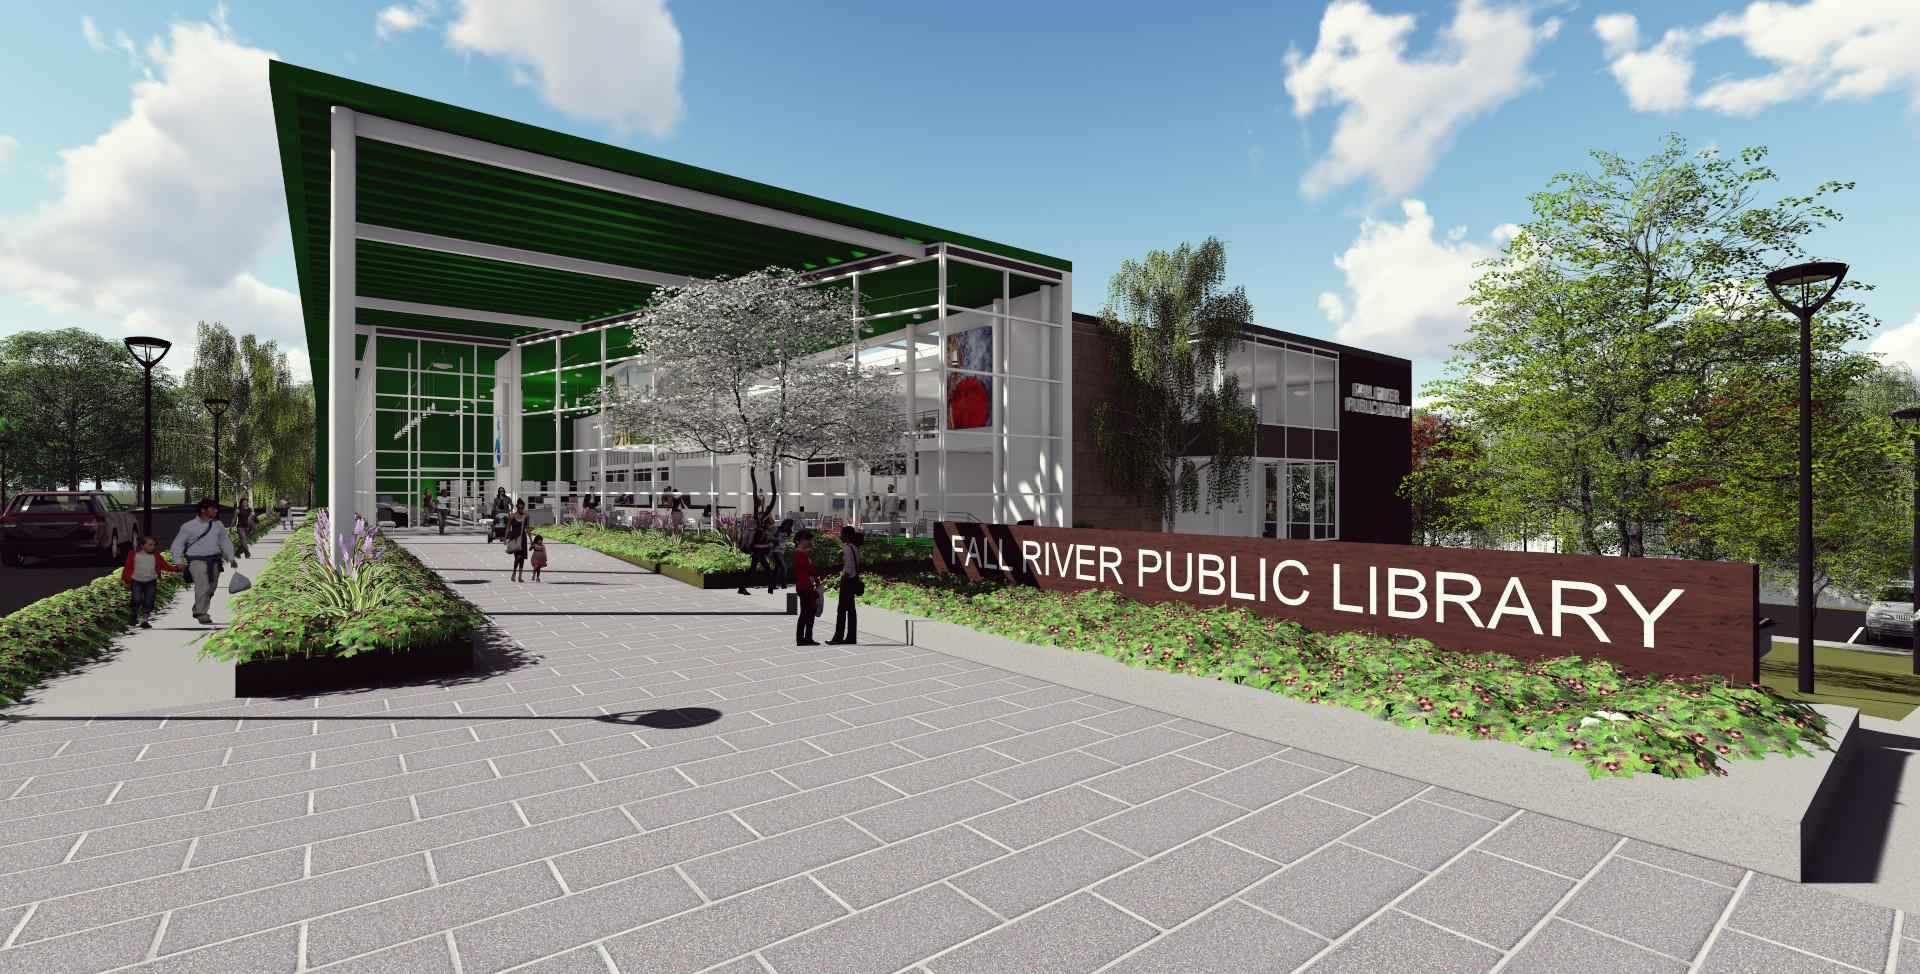 Fall River Public Library